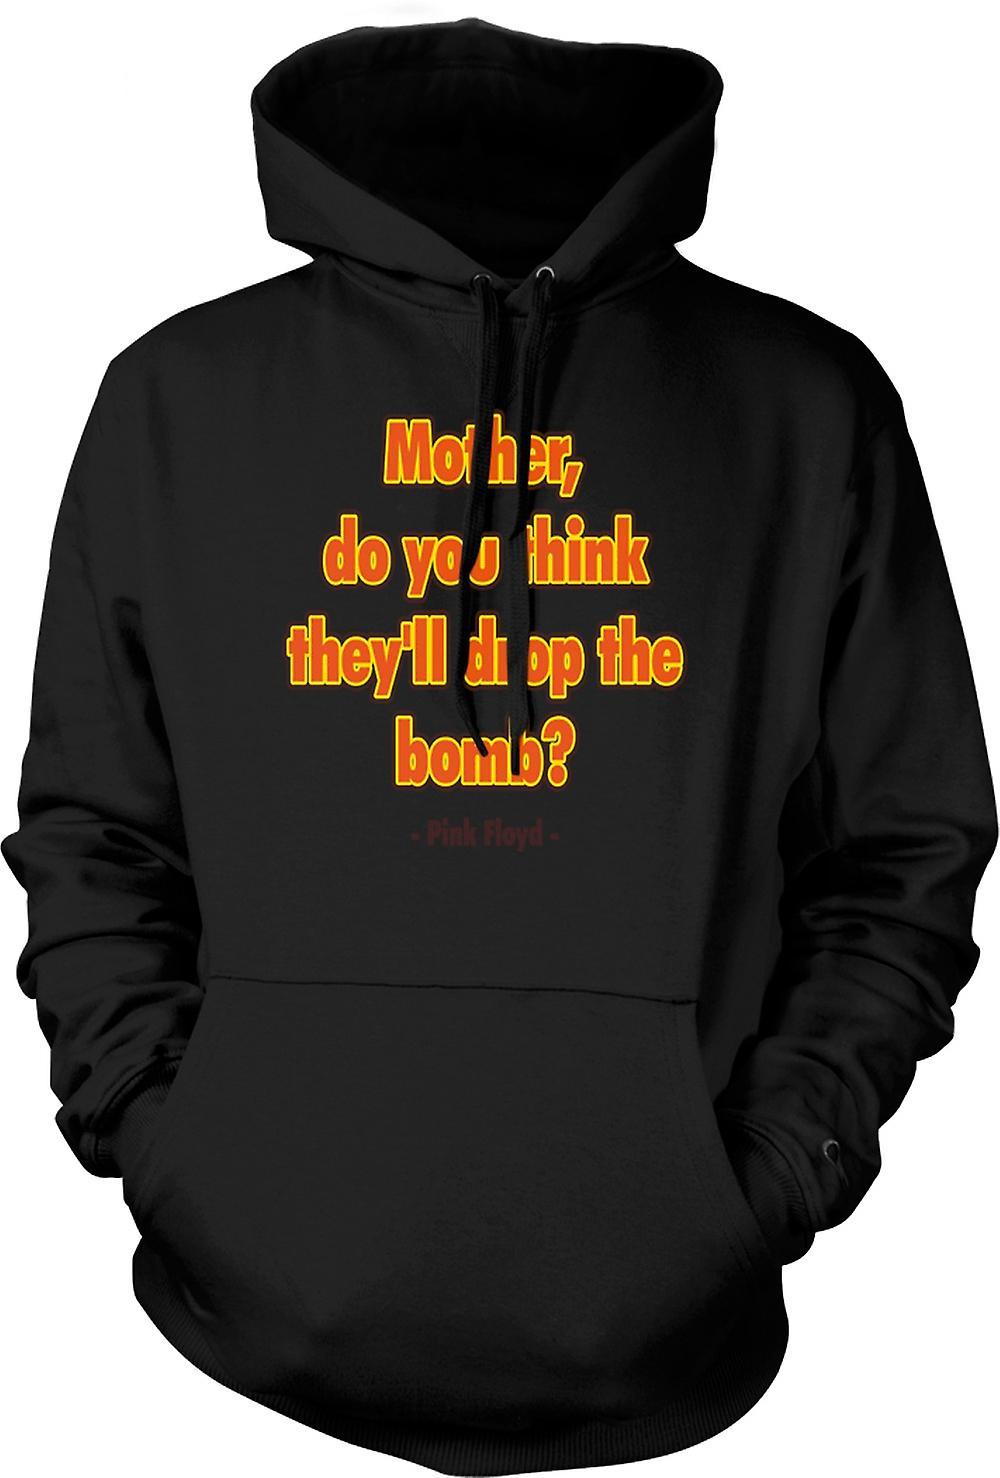 Para hombre con capucha - madre, crees que te caiga la bomba